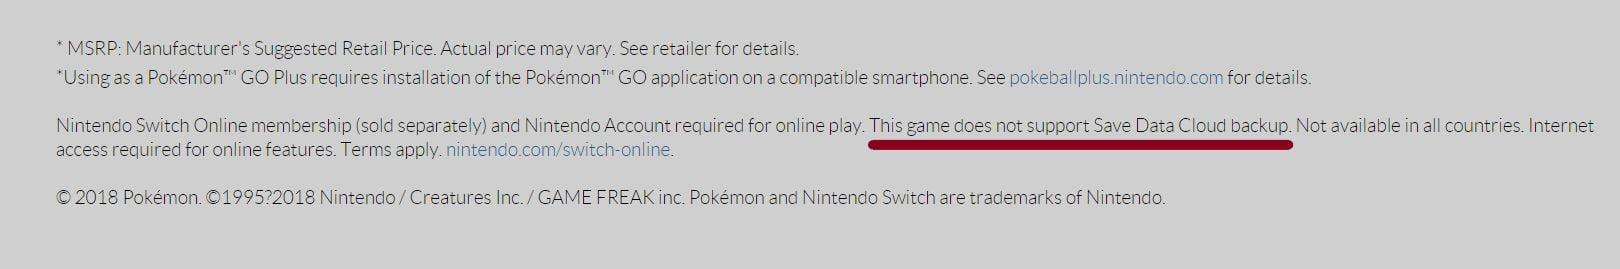 Nintendo Switch Cloud